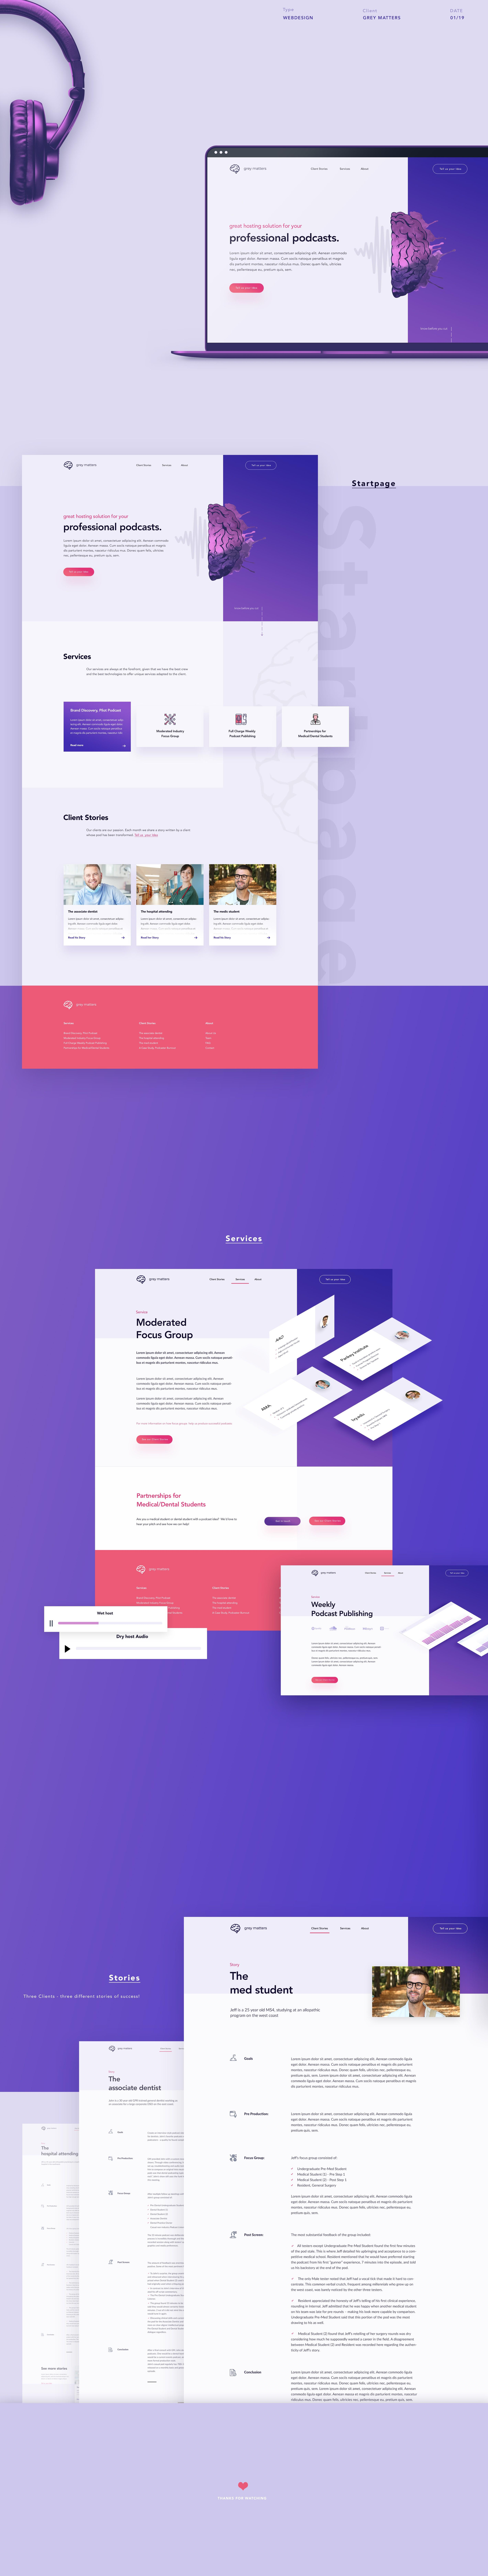 Grey Matters, Web Design